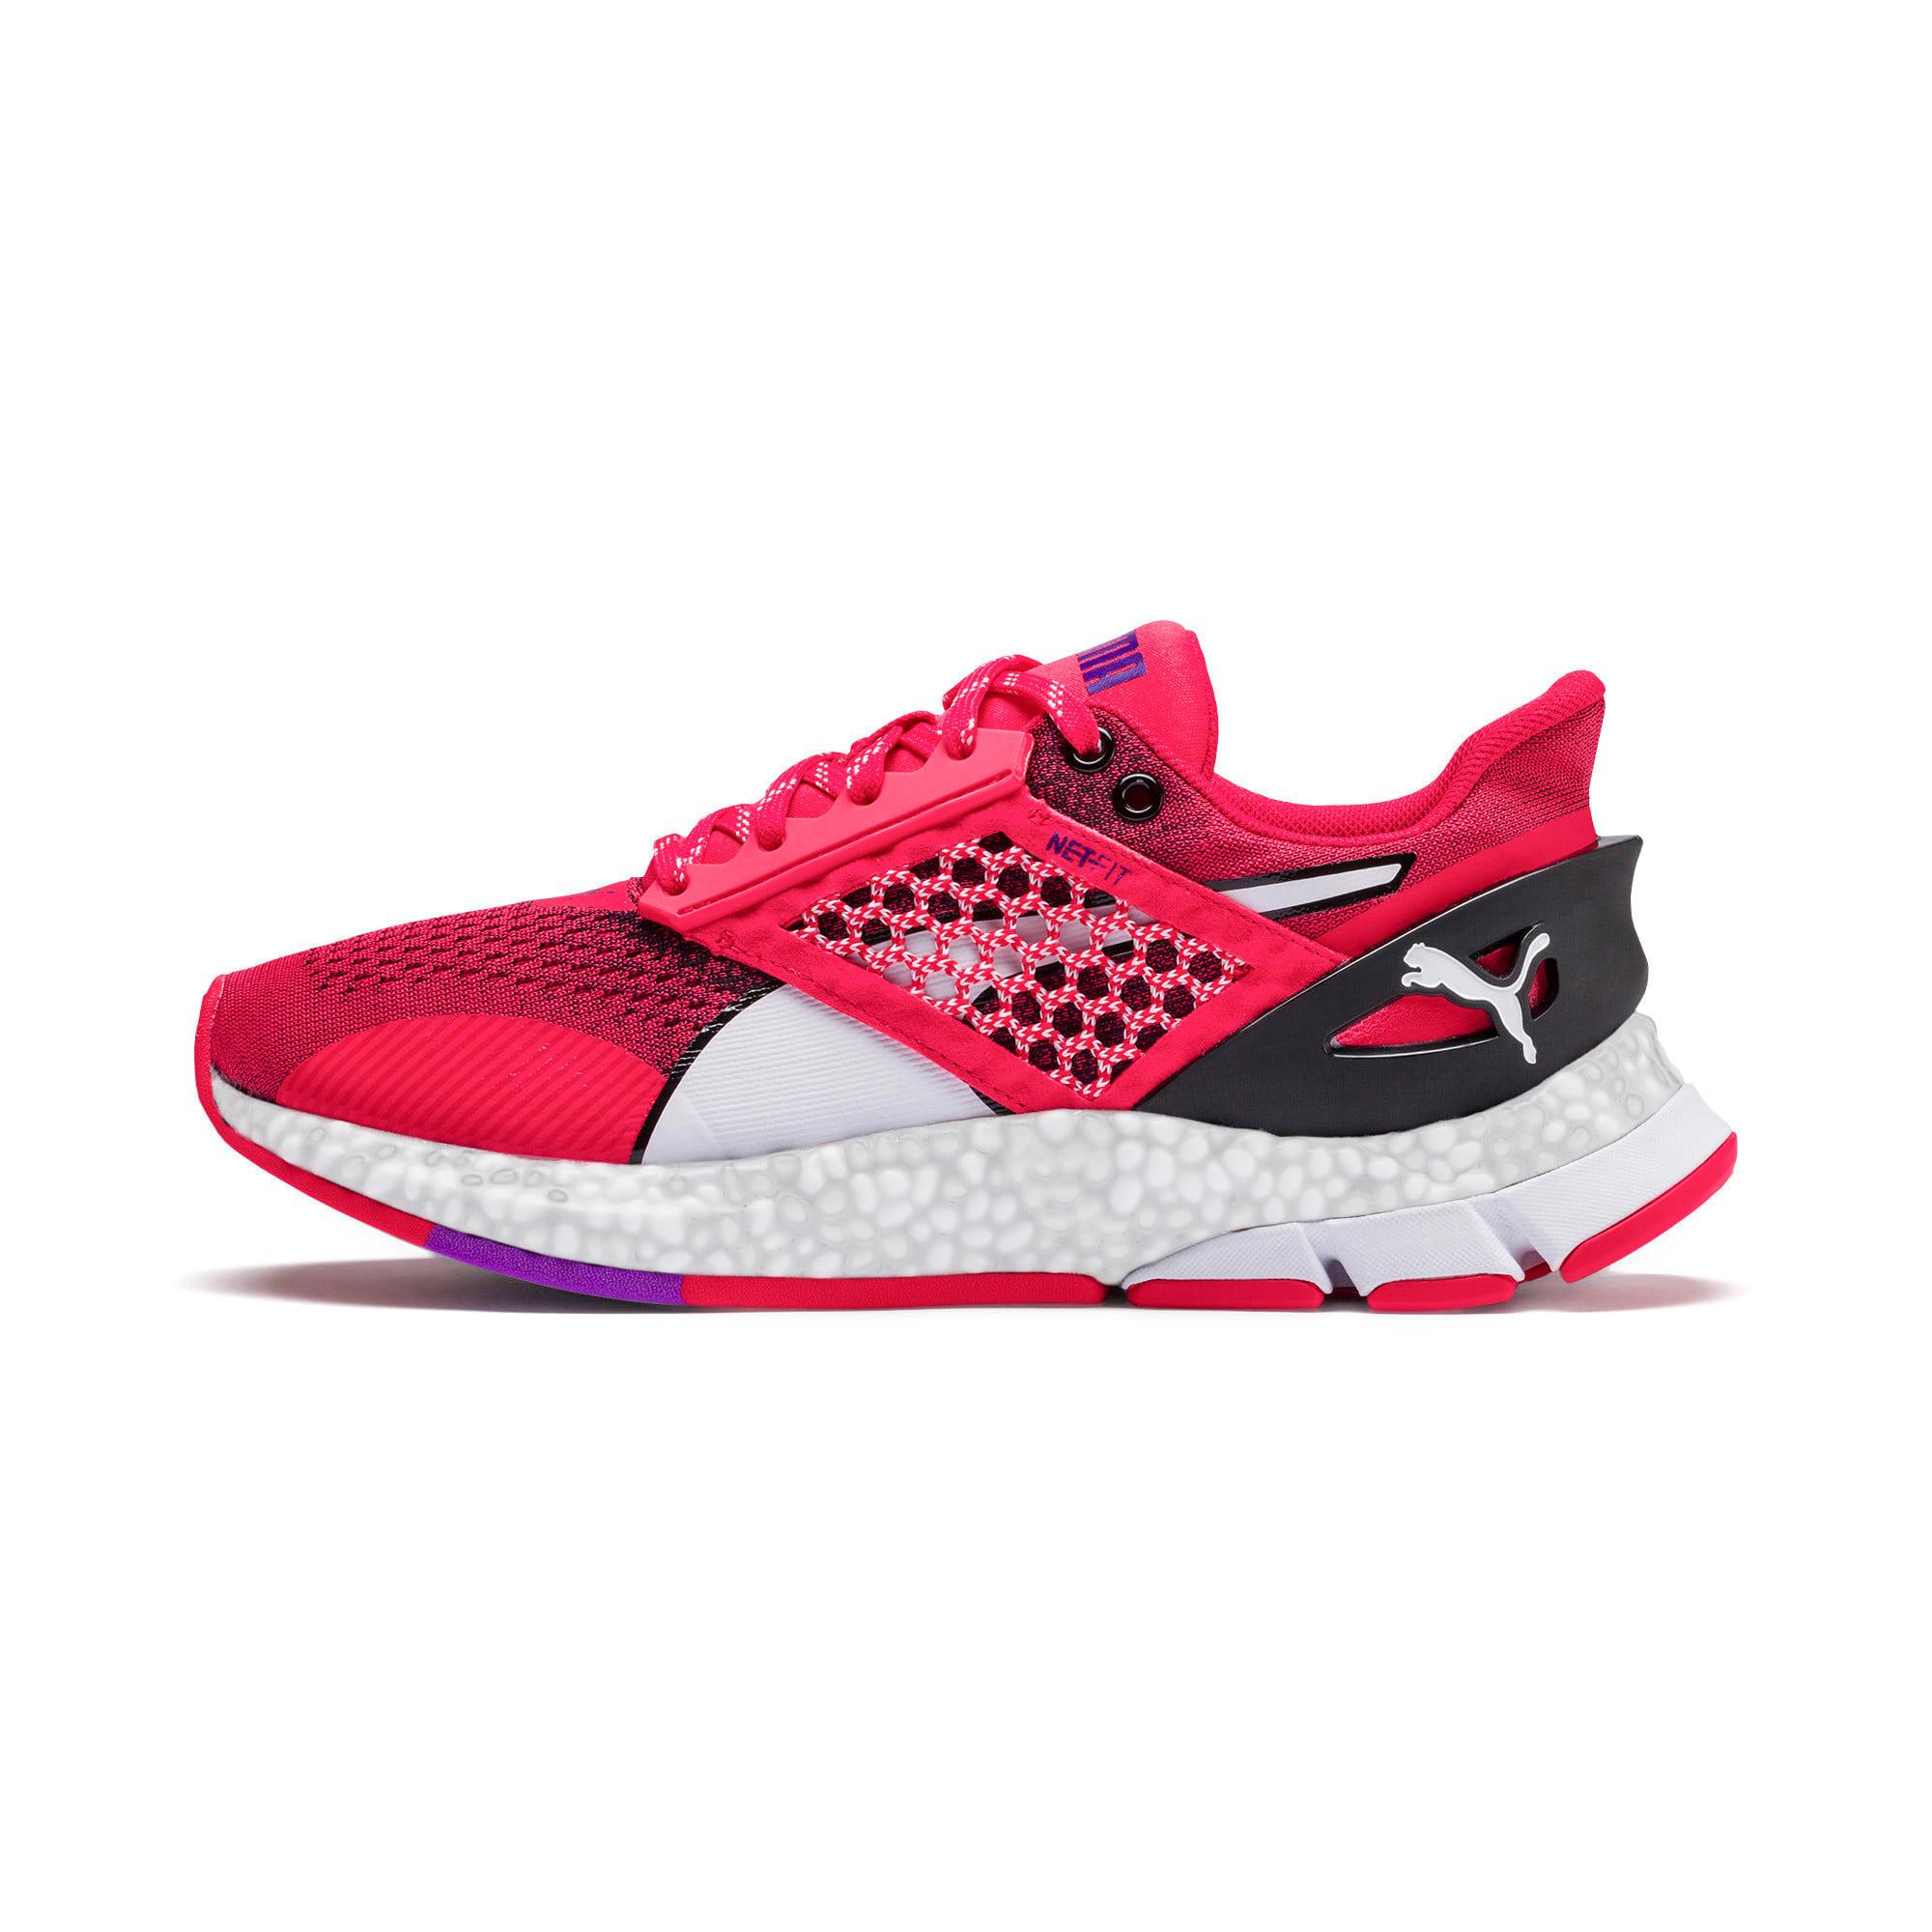 Thumbnail 1 of HYBRID NETFIT Astro Women's Running Shoes, Nrgy Rose-Puma Black, medium